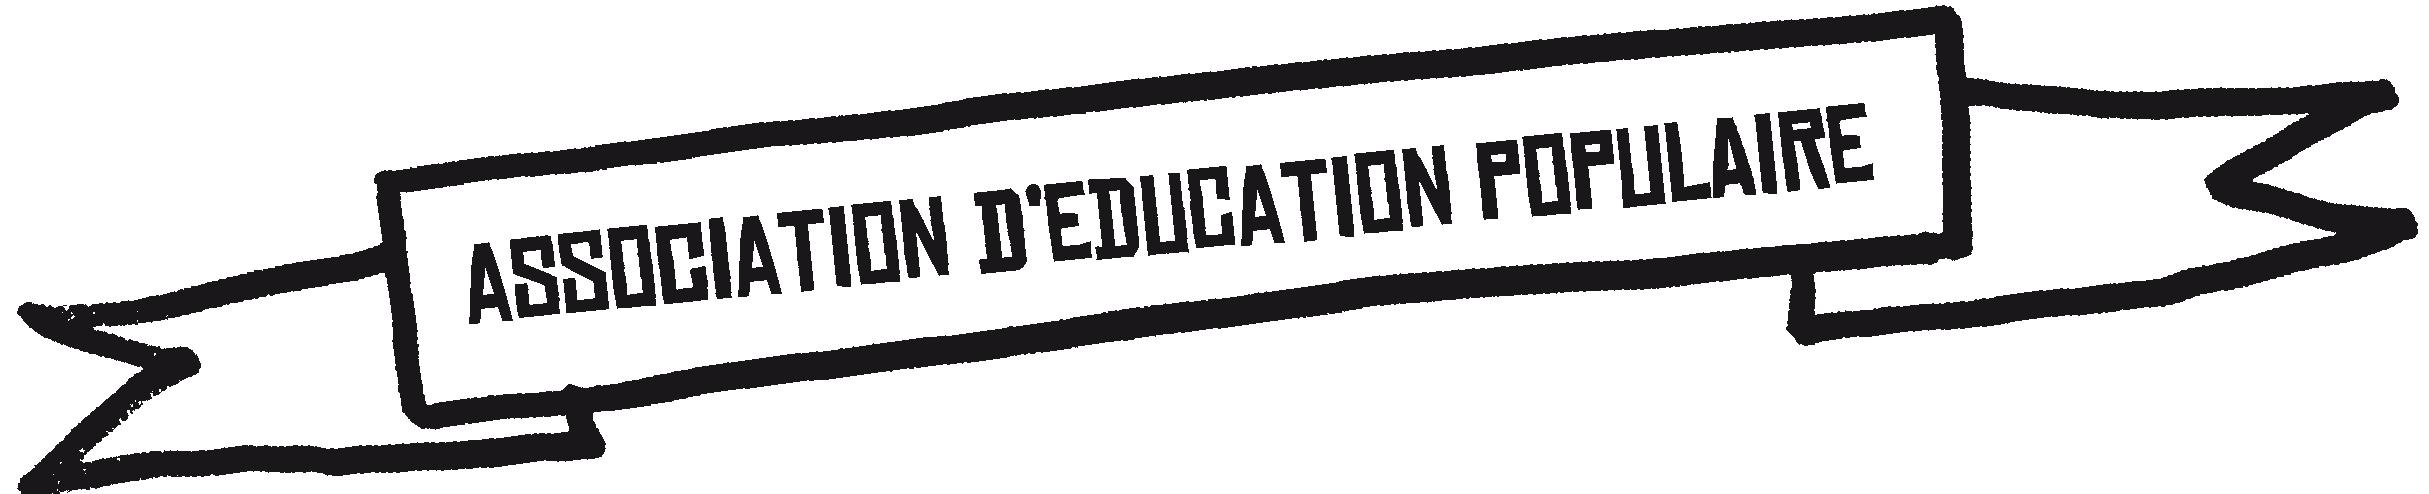 logo_educ_pop-03